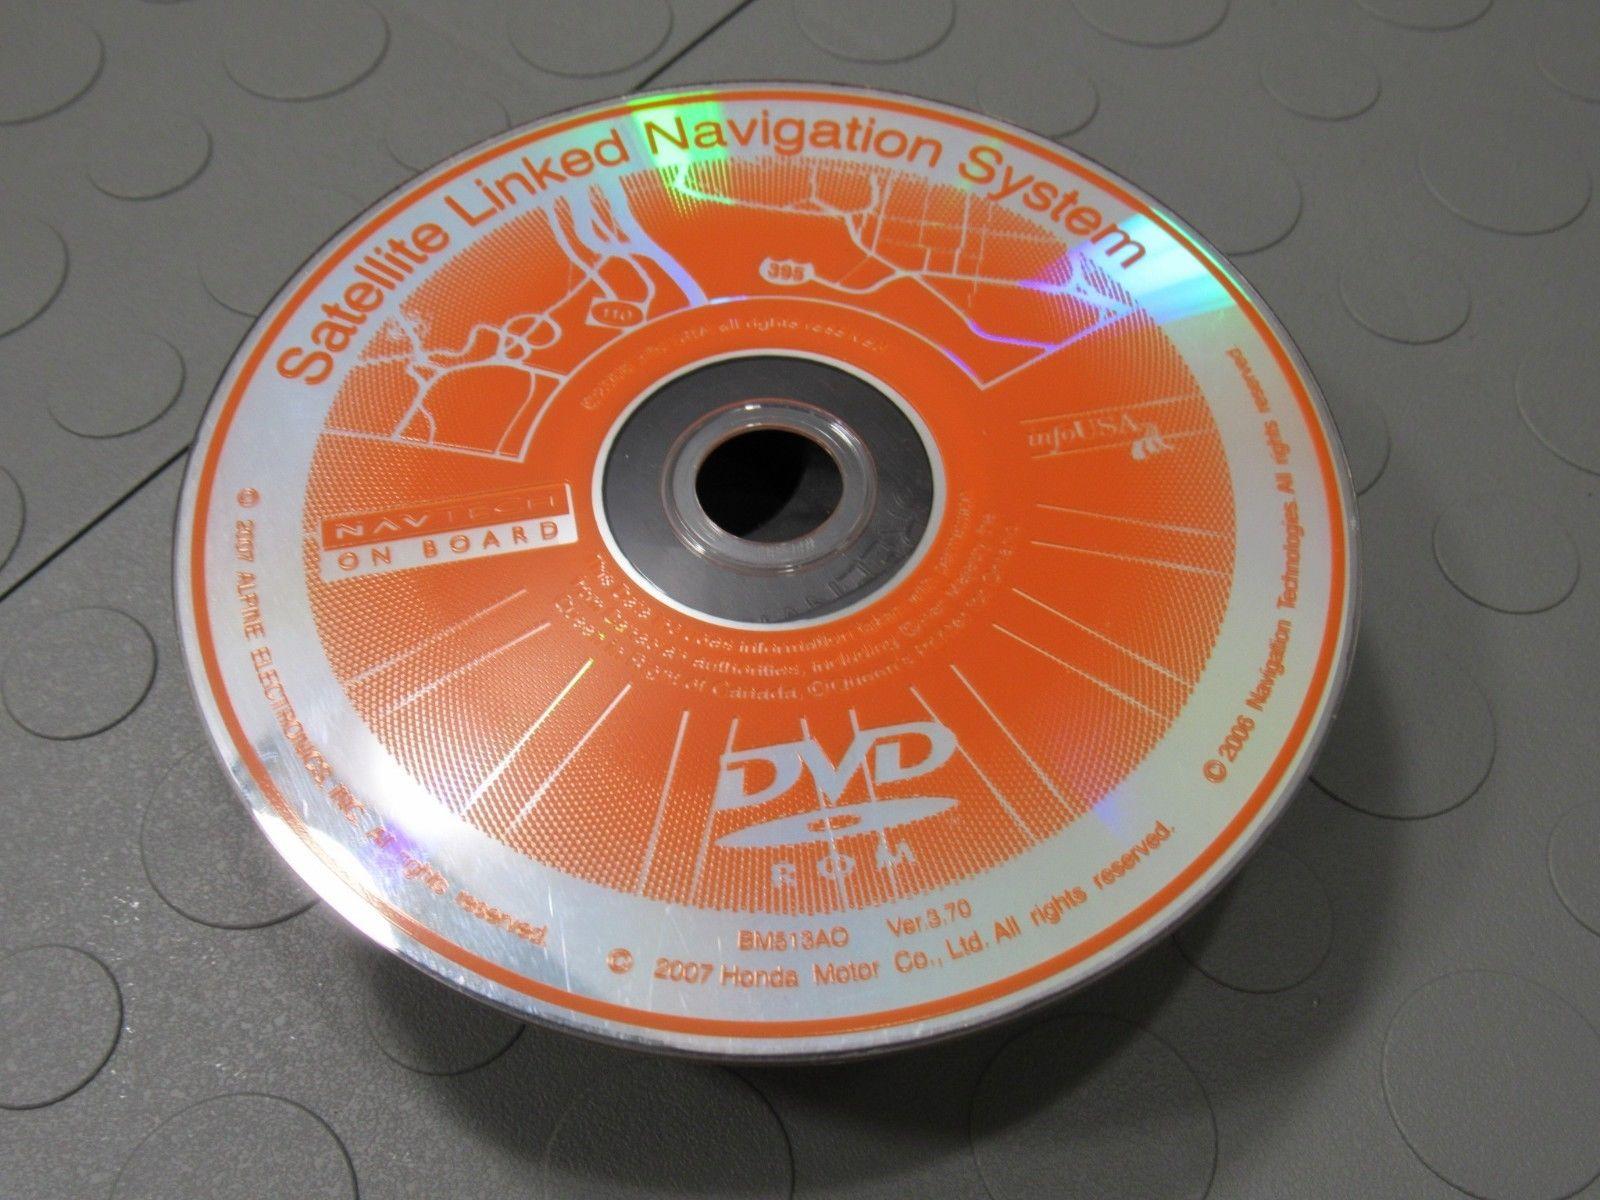 2005 honda accord navigation reset